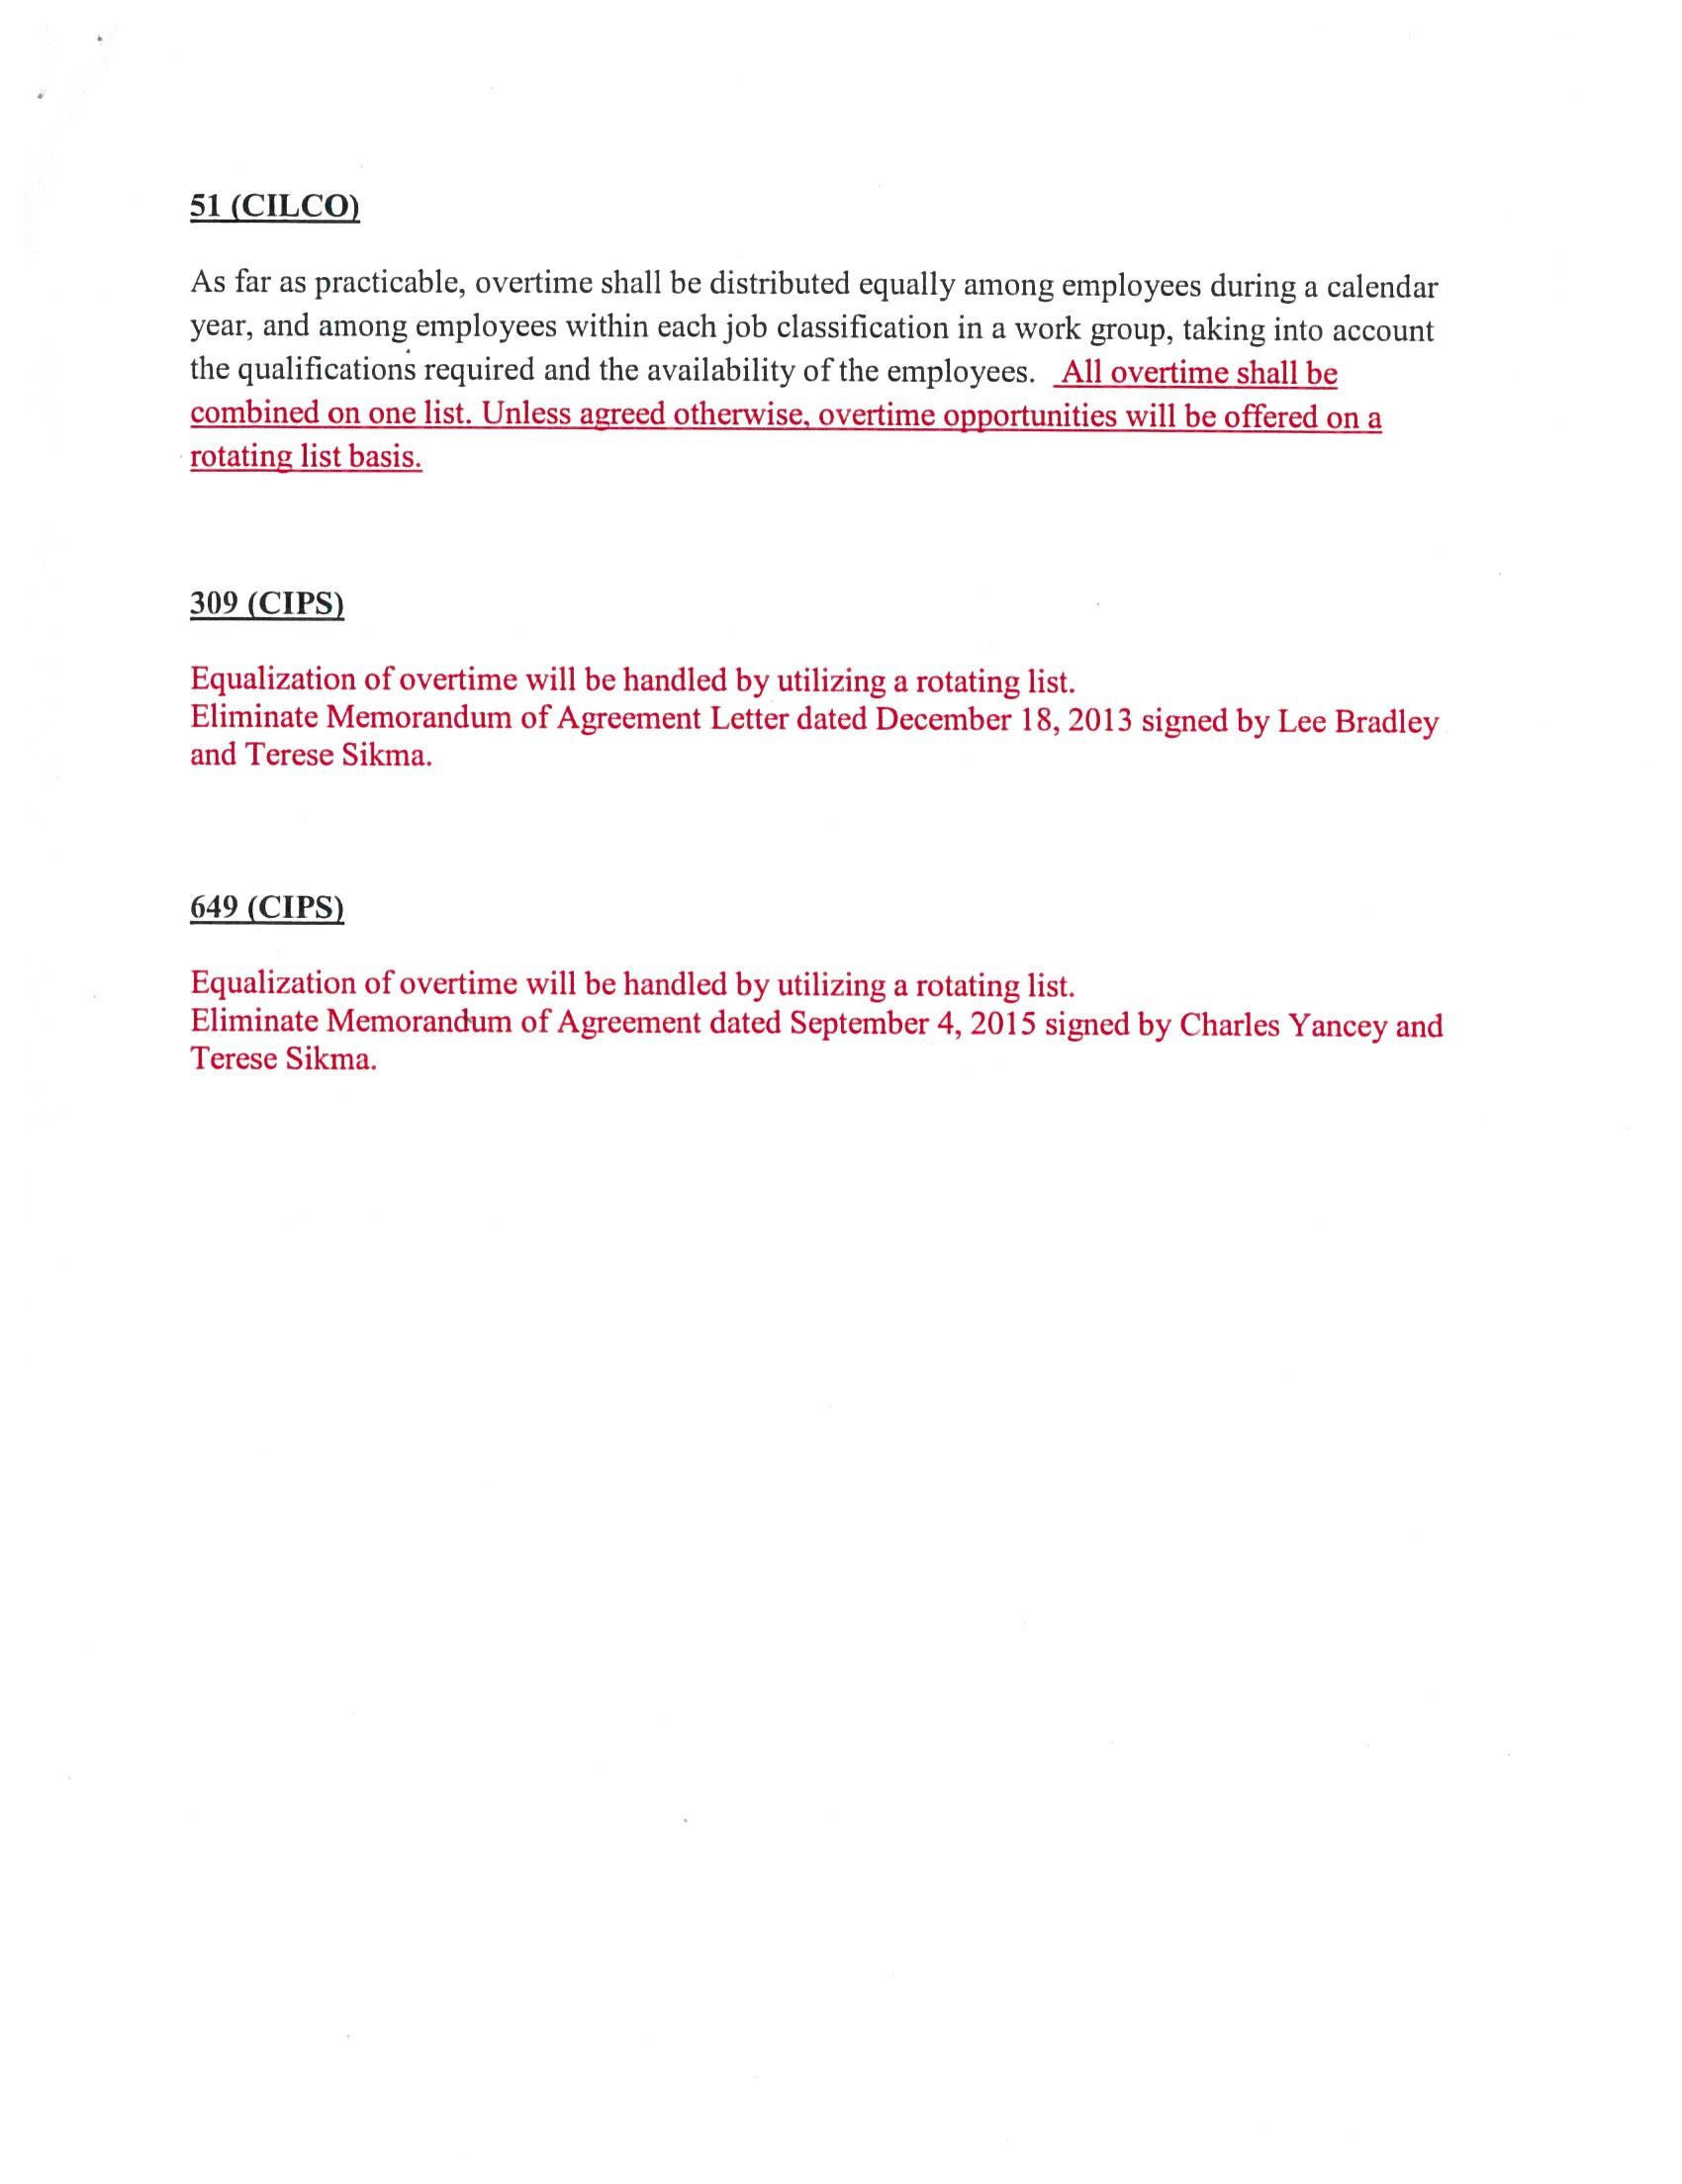 Ameren Clerical CP9 040517.jpg